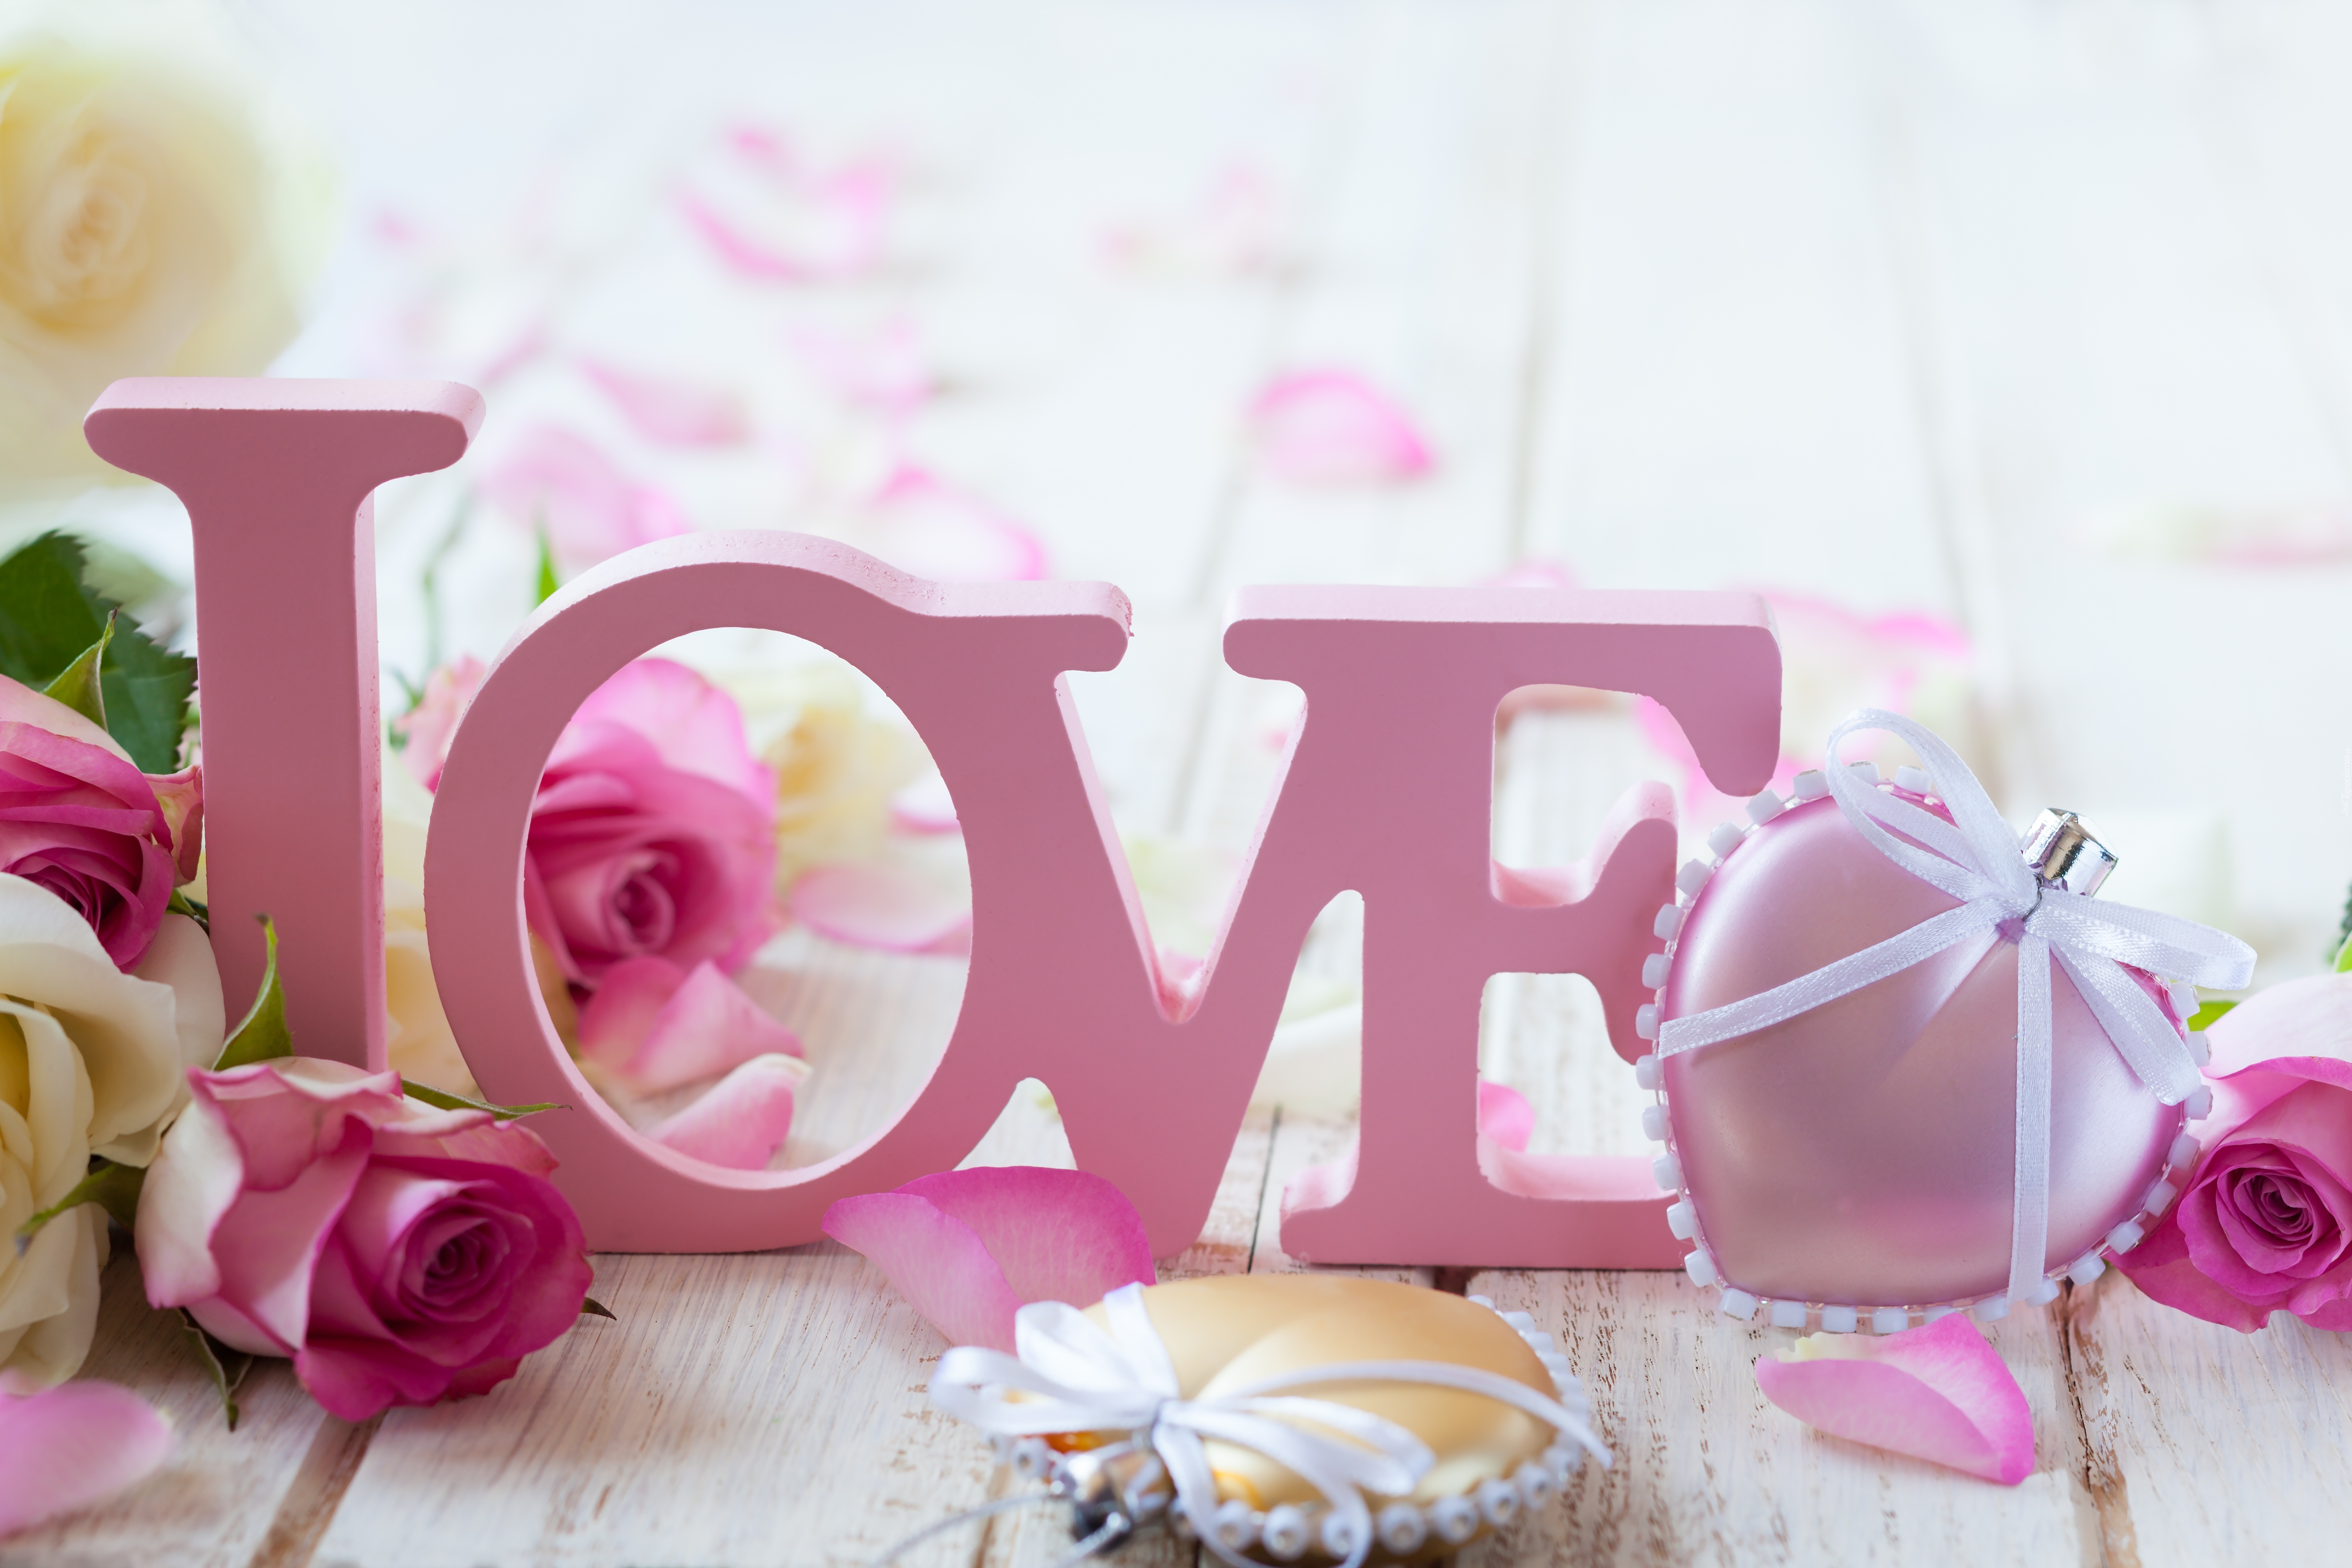 Róże, Kwiaty, Napis, Love, Serce